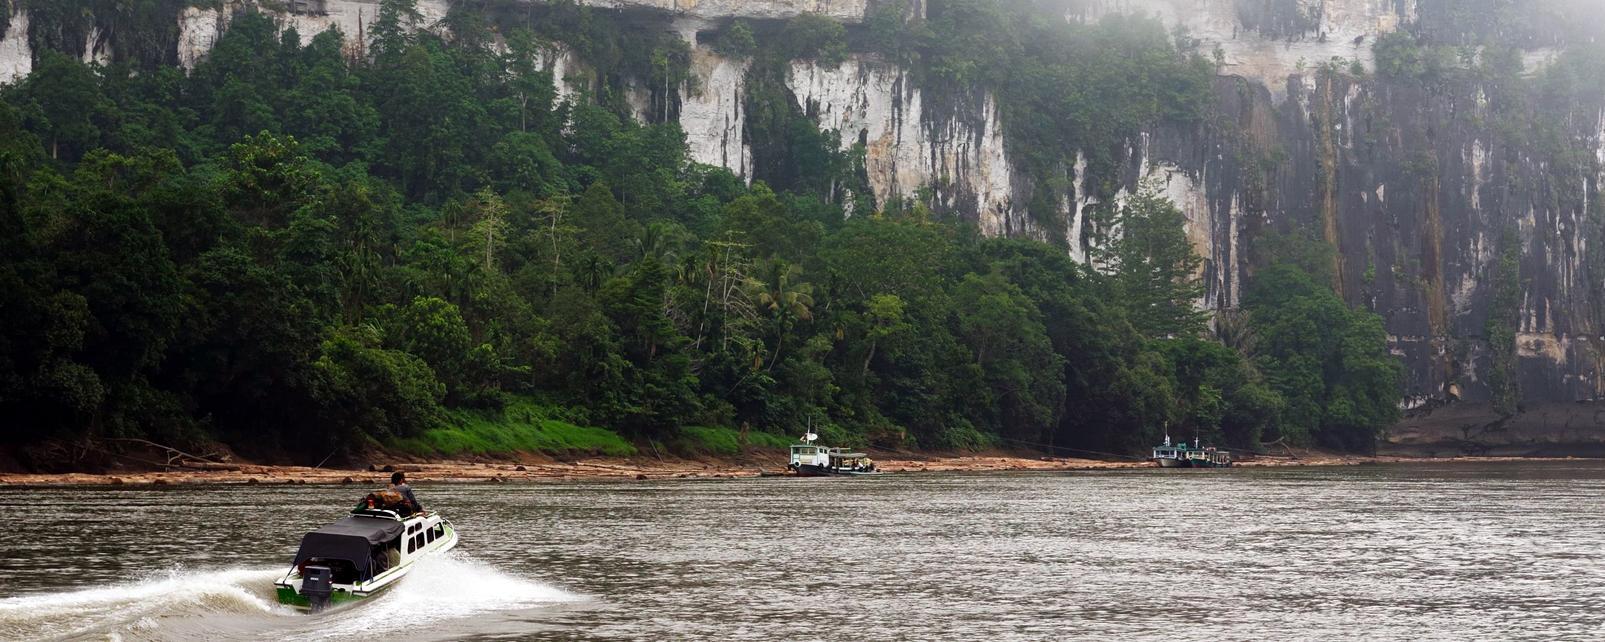 Asie, Indonésie, Kalimantan, Bornéo, fleuve, Mahakam, bateau, montagne,